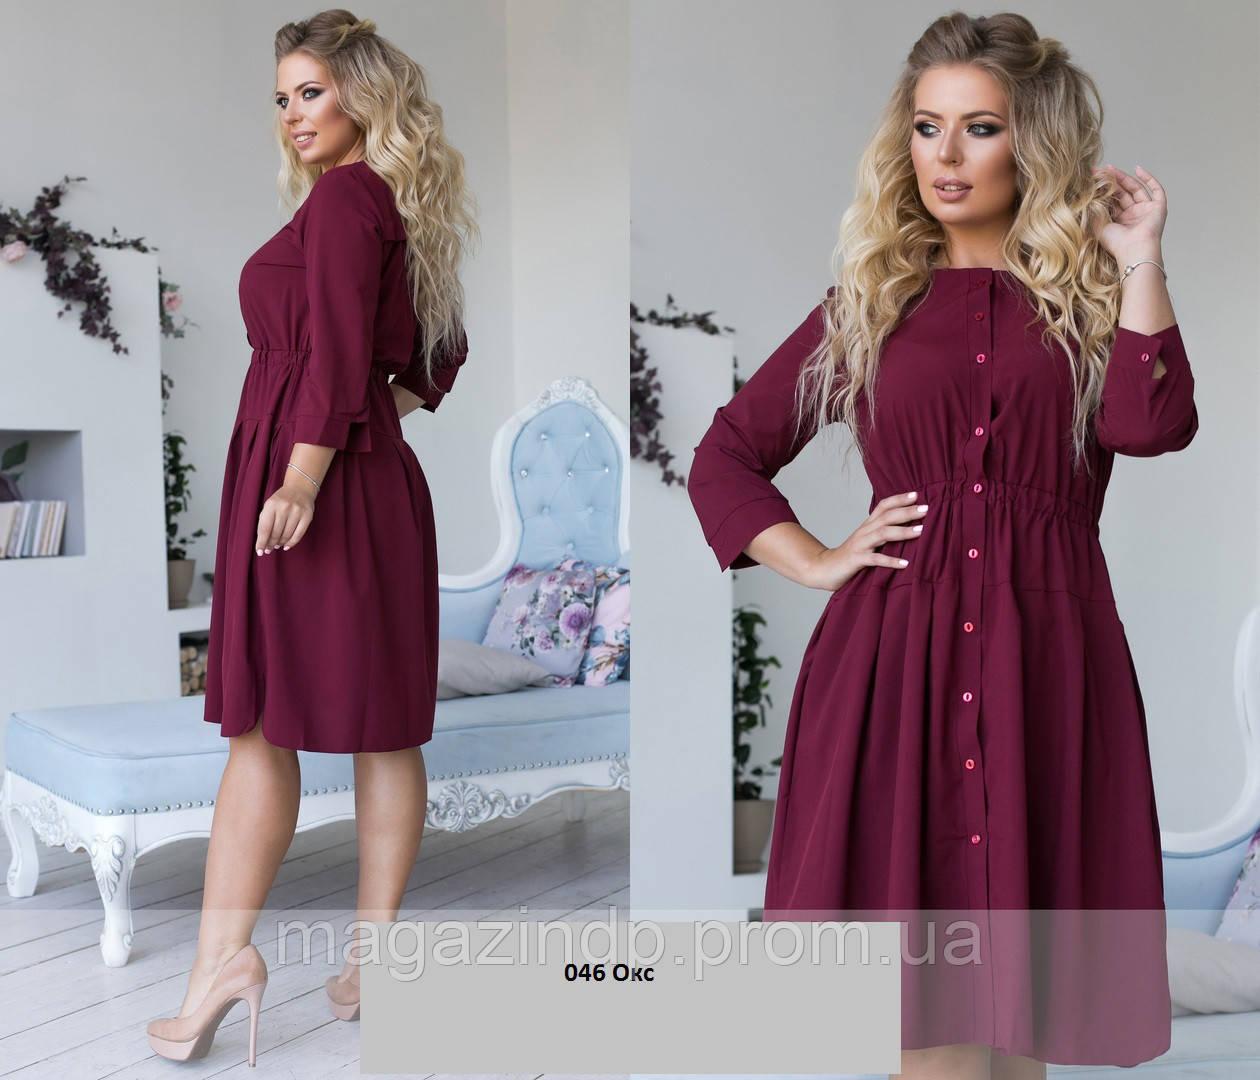 Платье-рубашка  батал 046 Окс Код:766541936